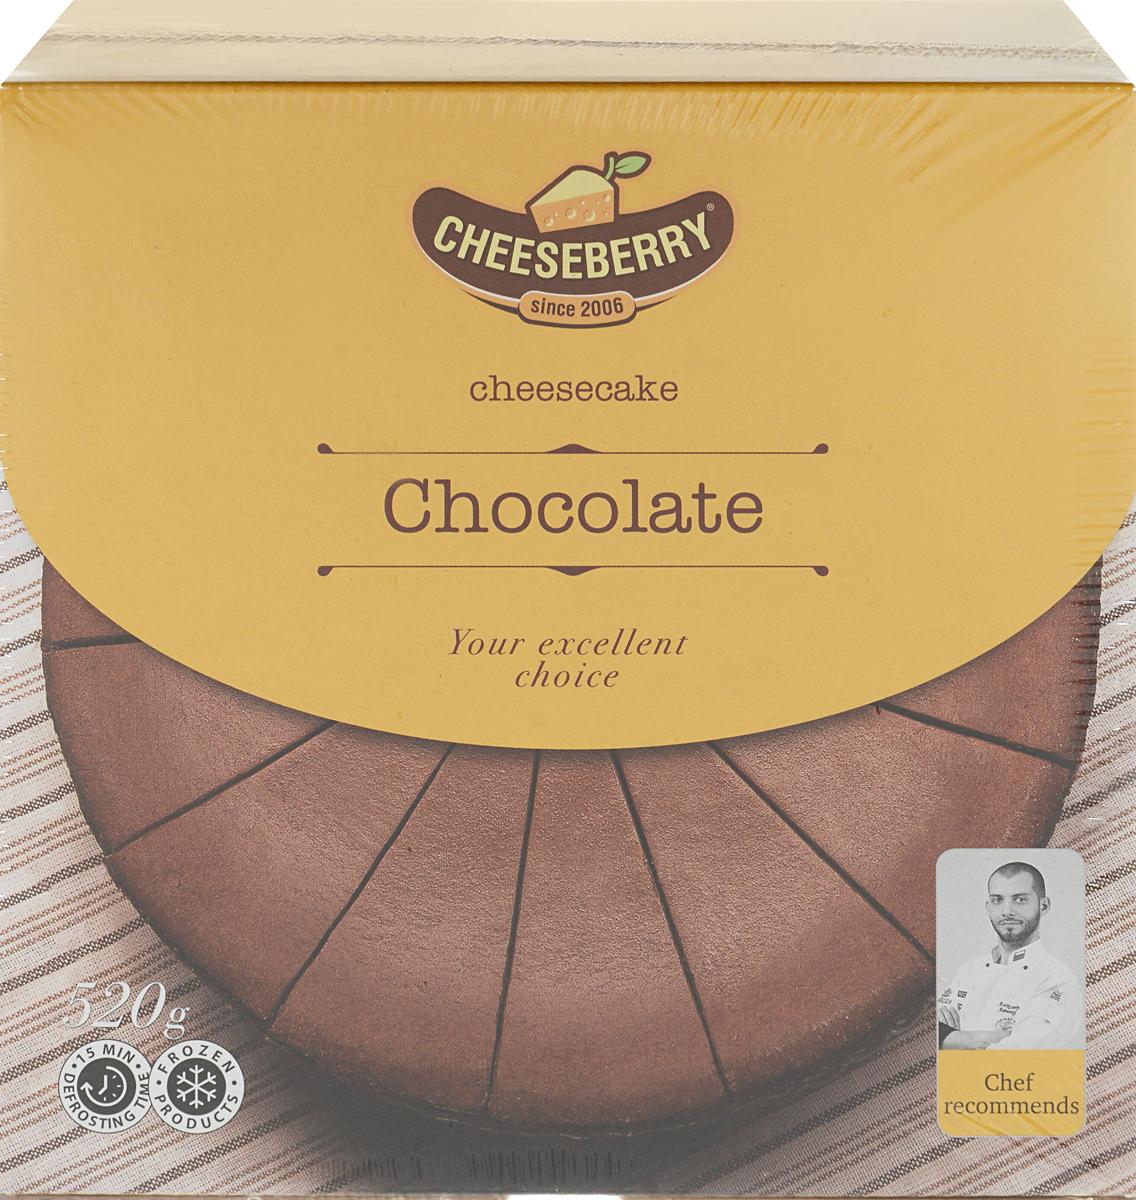 Cheeseberry Чизкейк Шоколадный, 520 г недорого